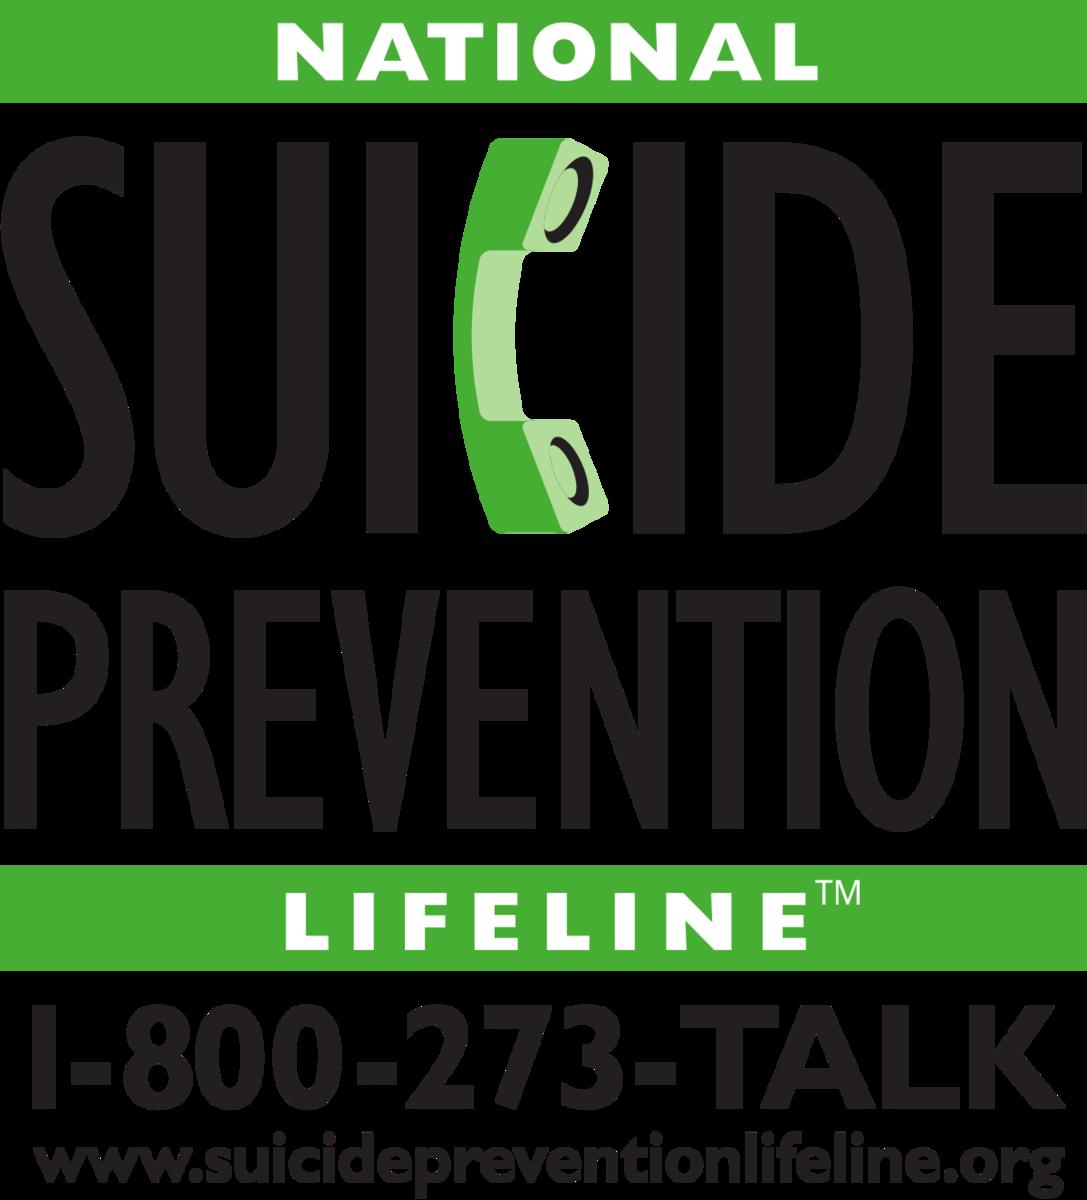 National Suicide Prevention Lifeline 800-273-8255